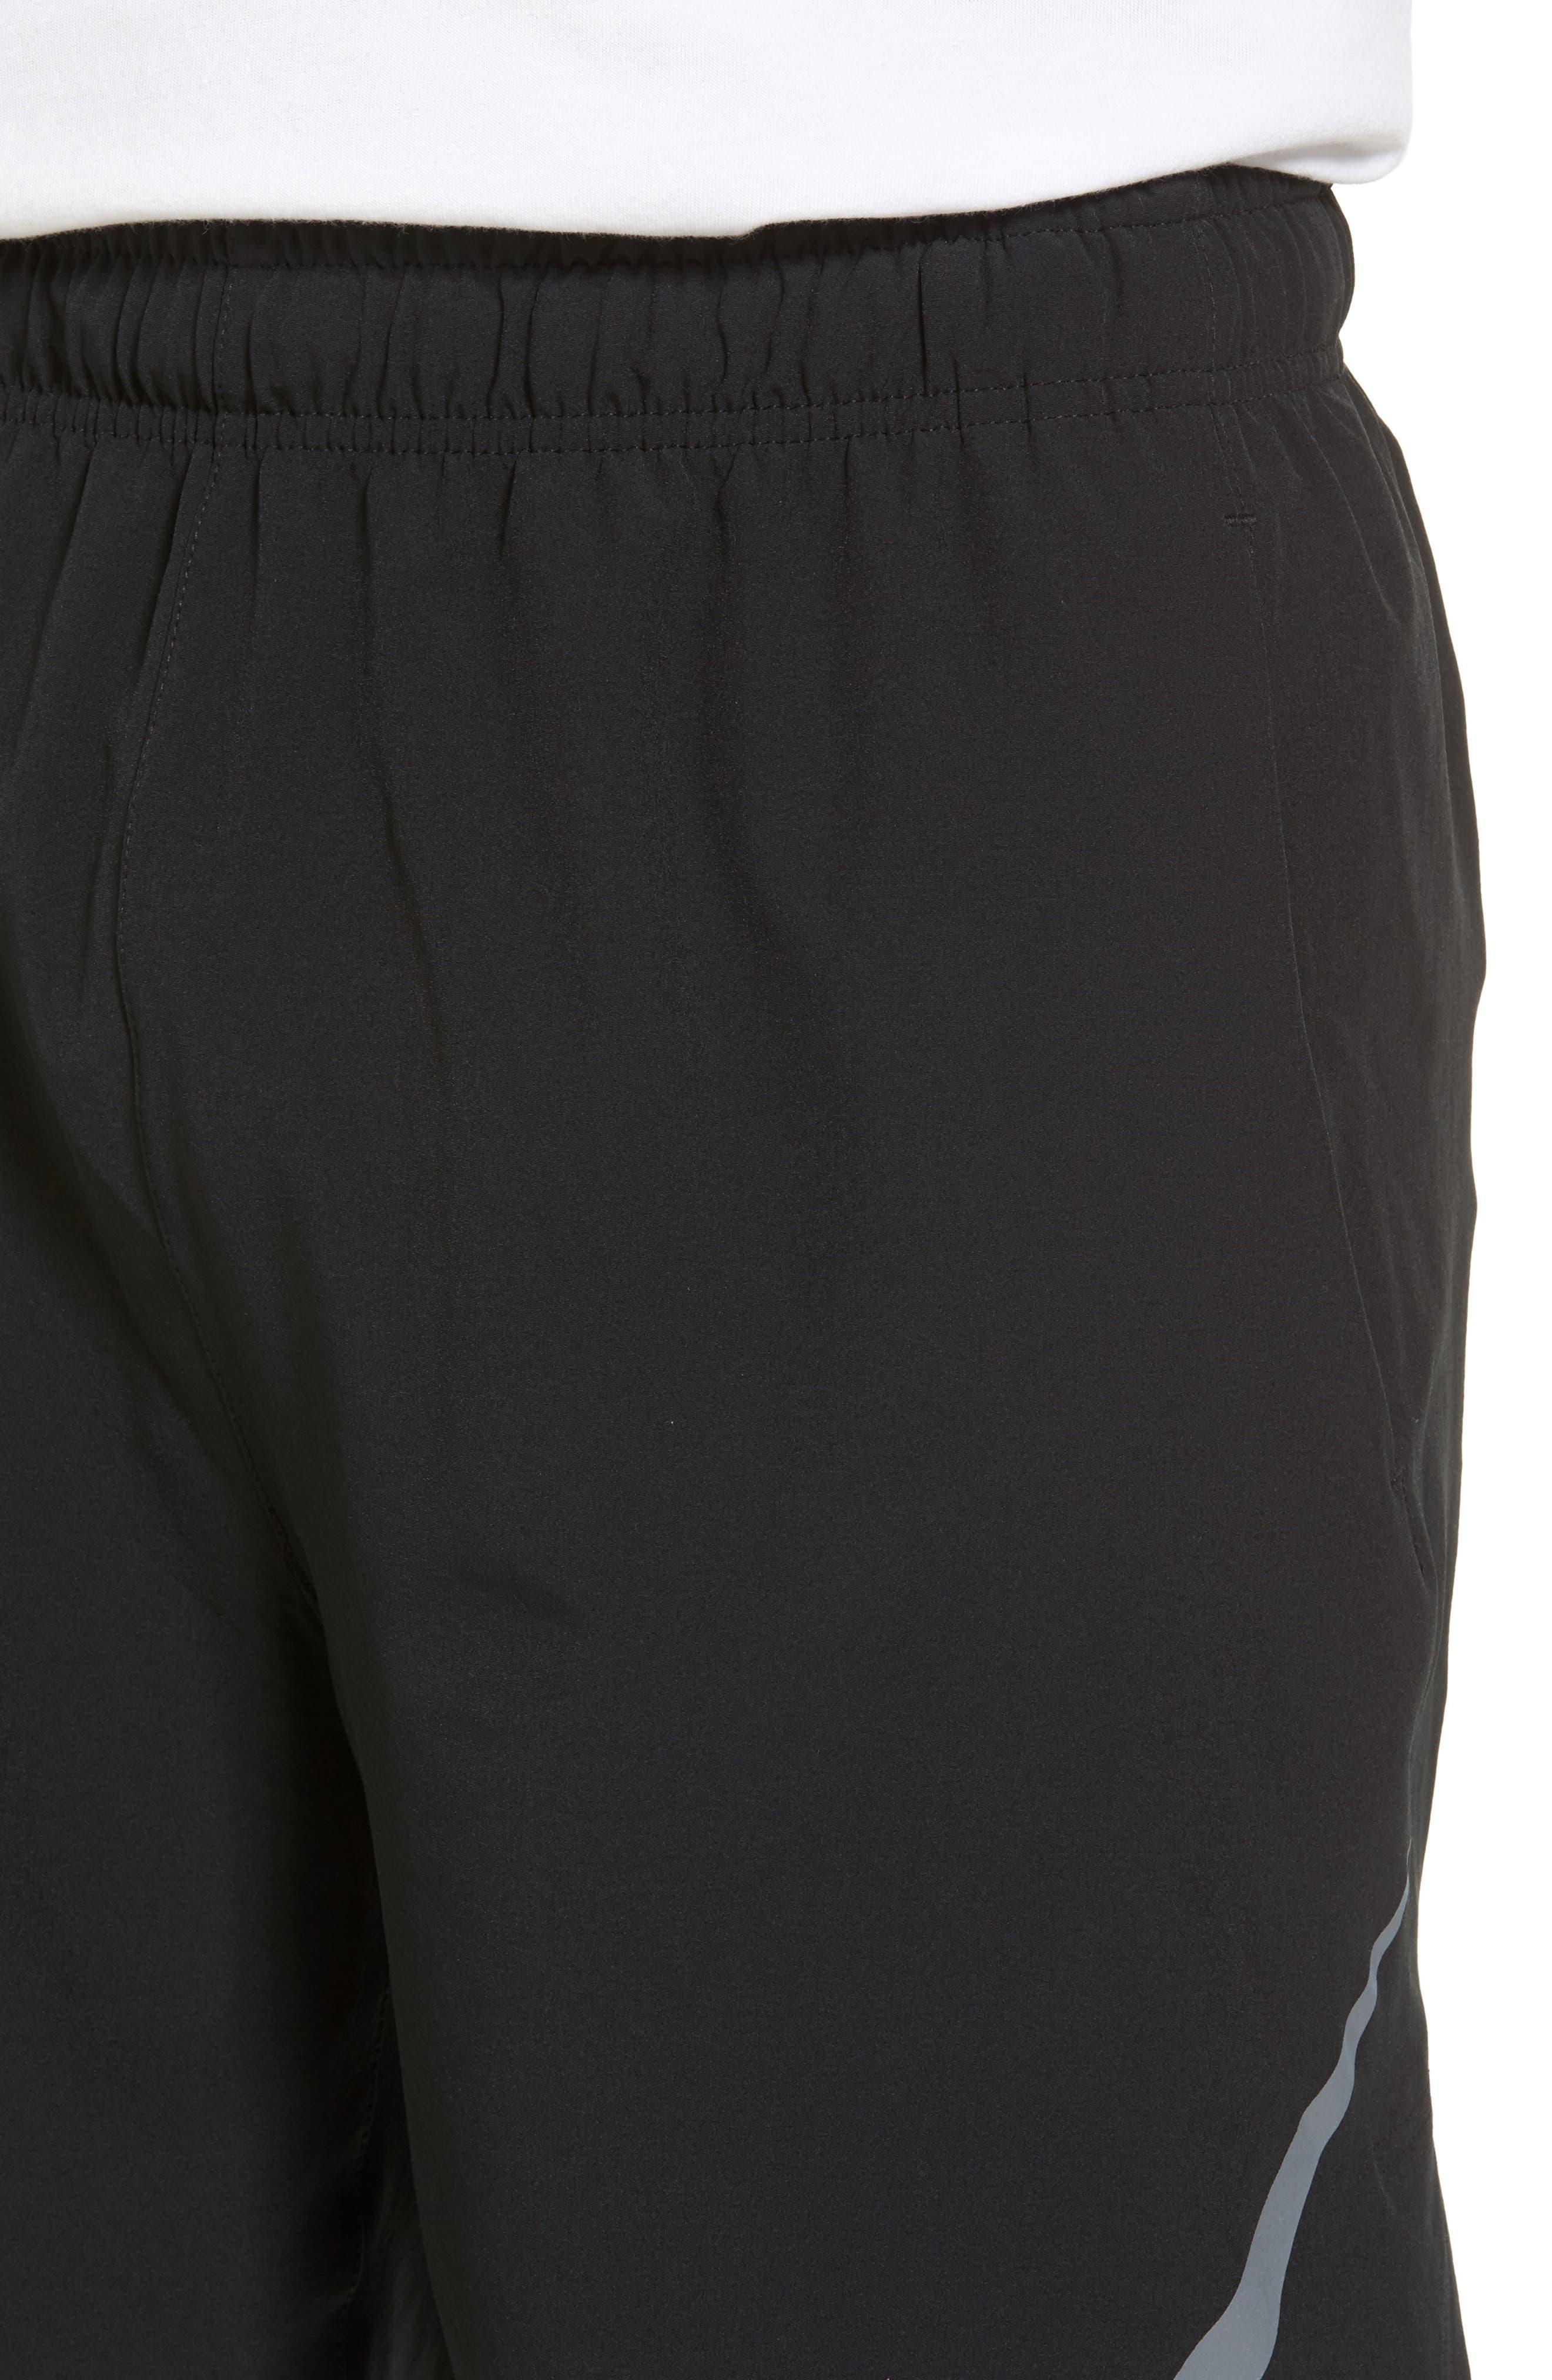 Flex Training Shorts,                             Alternate thumbnail 4, color,                             010